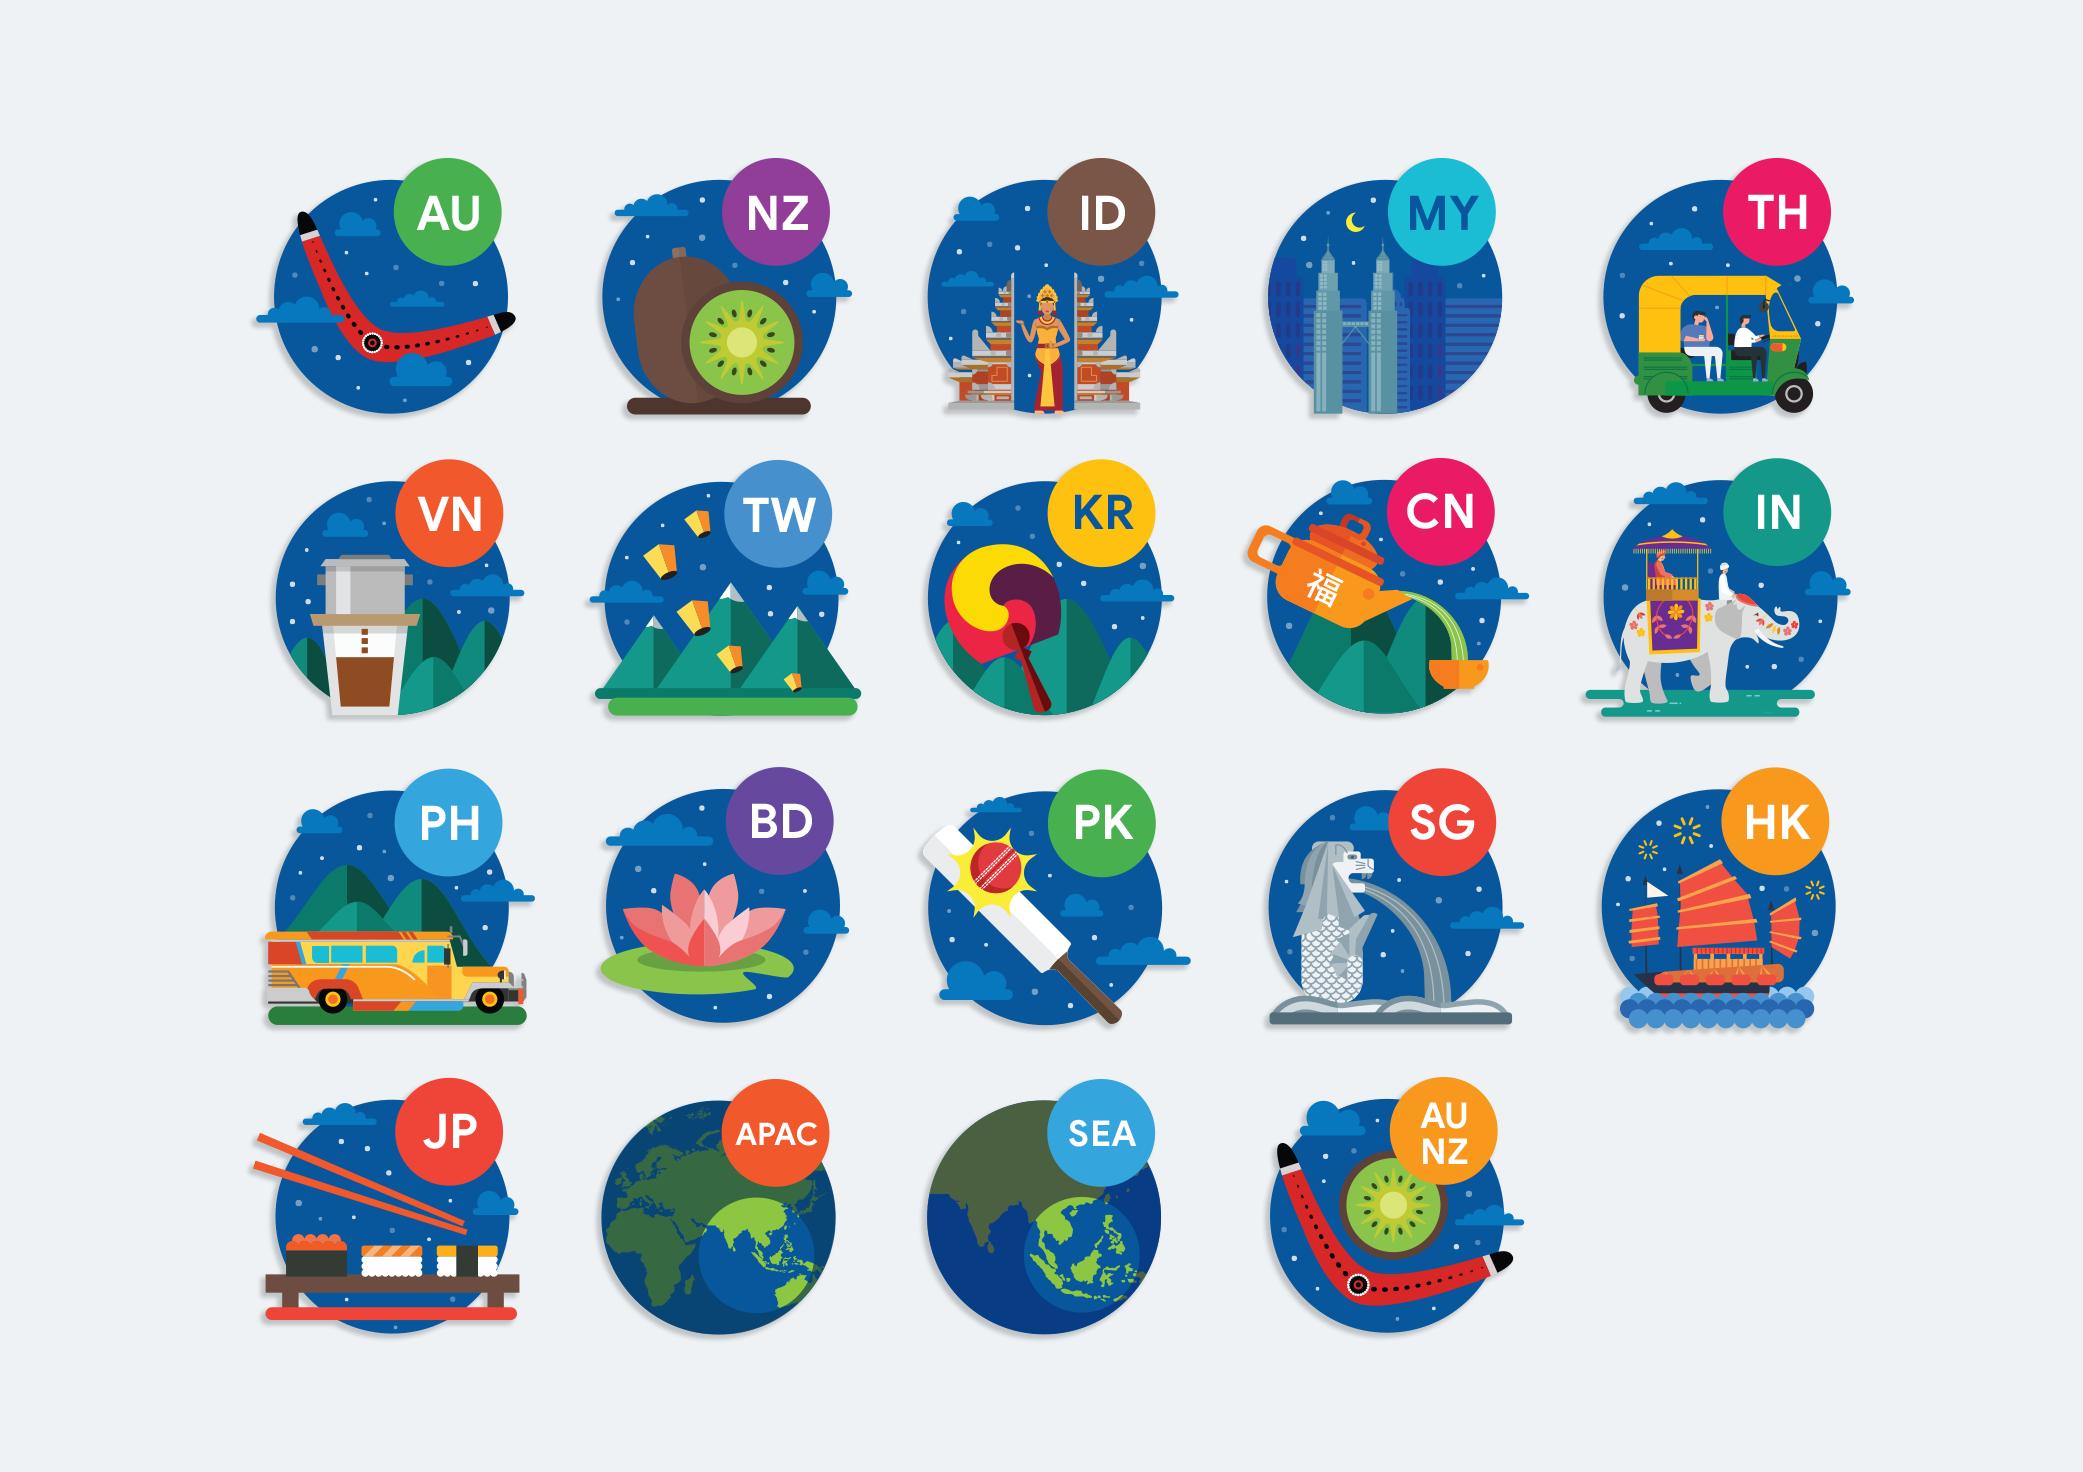 APAC 18 Countries icons